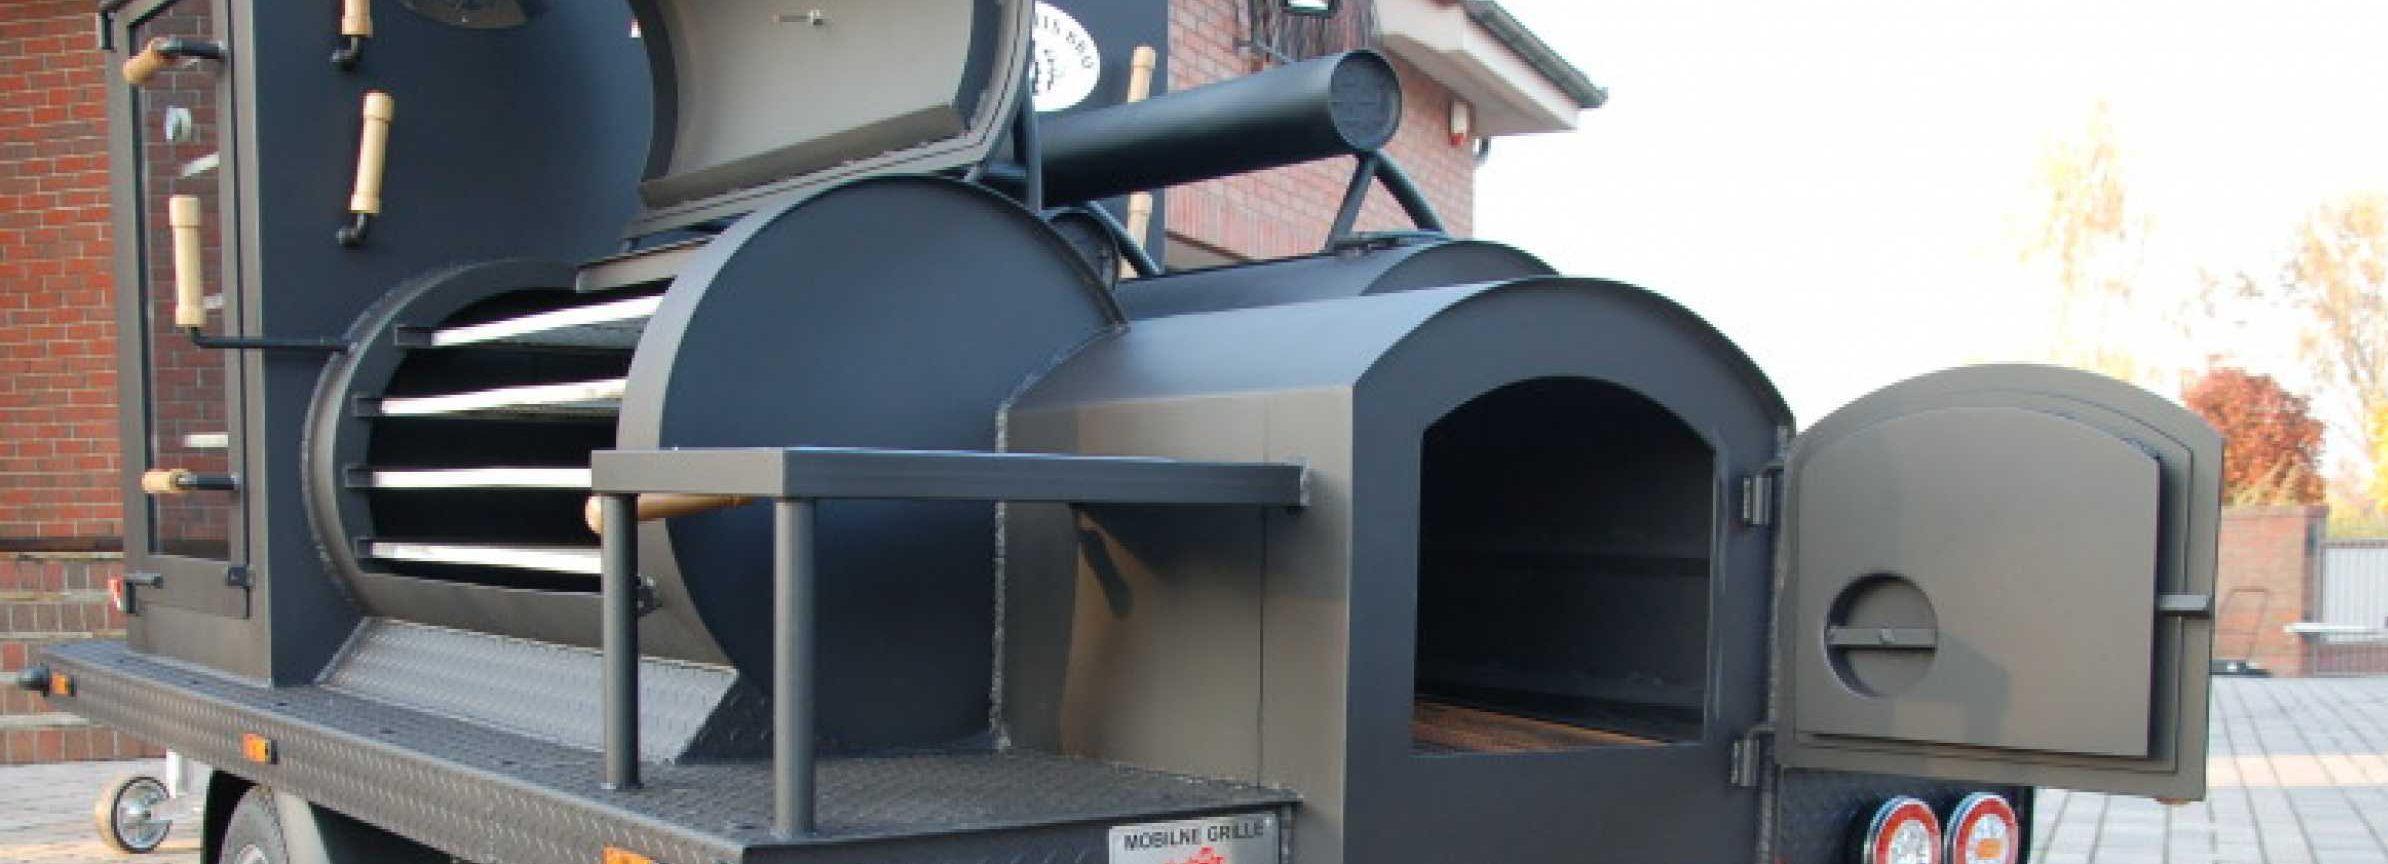 grill-smoker-edingershops